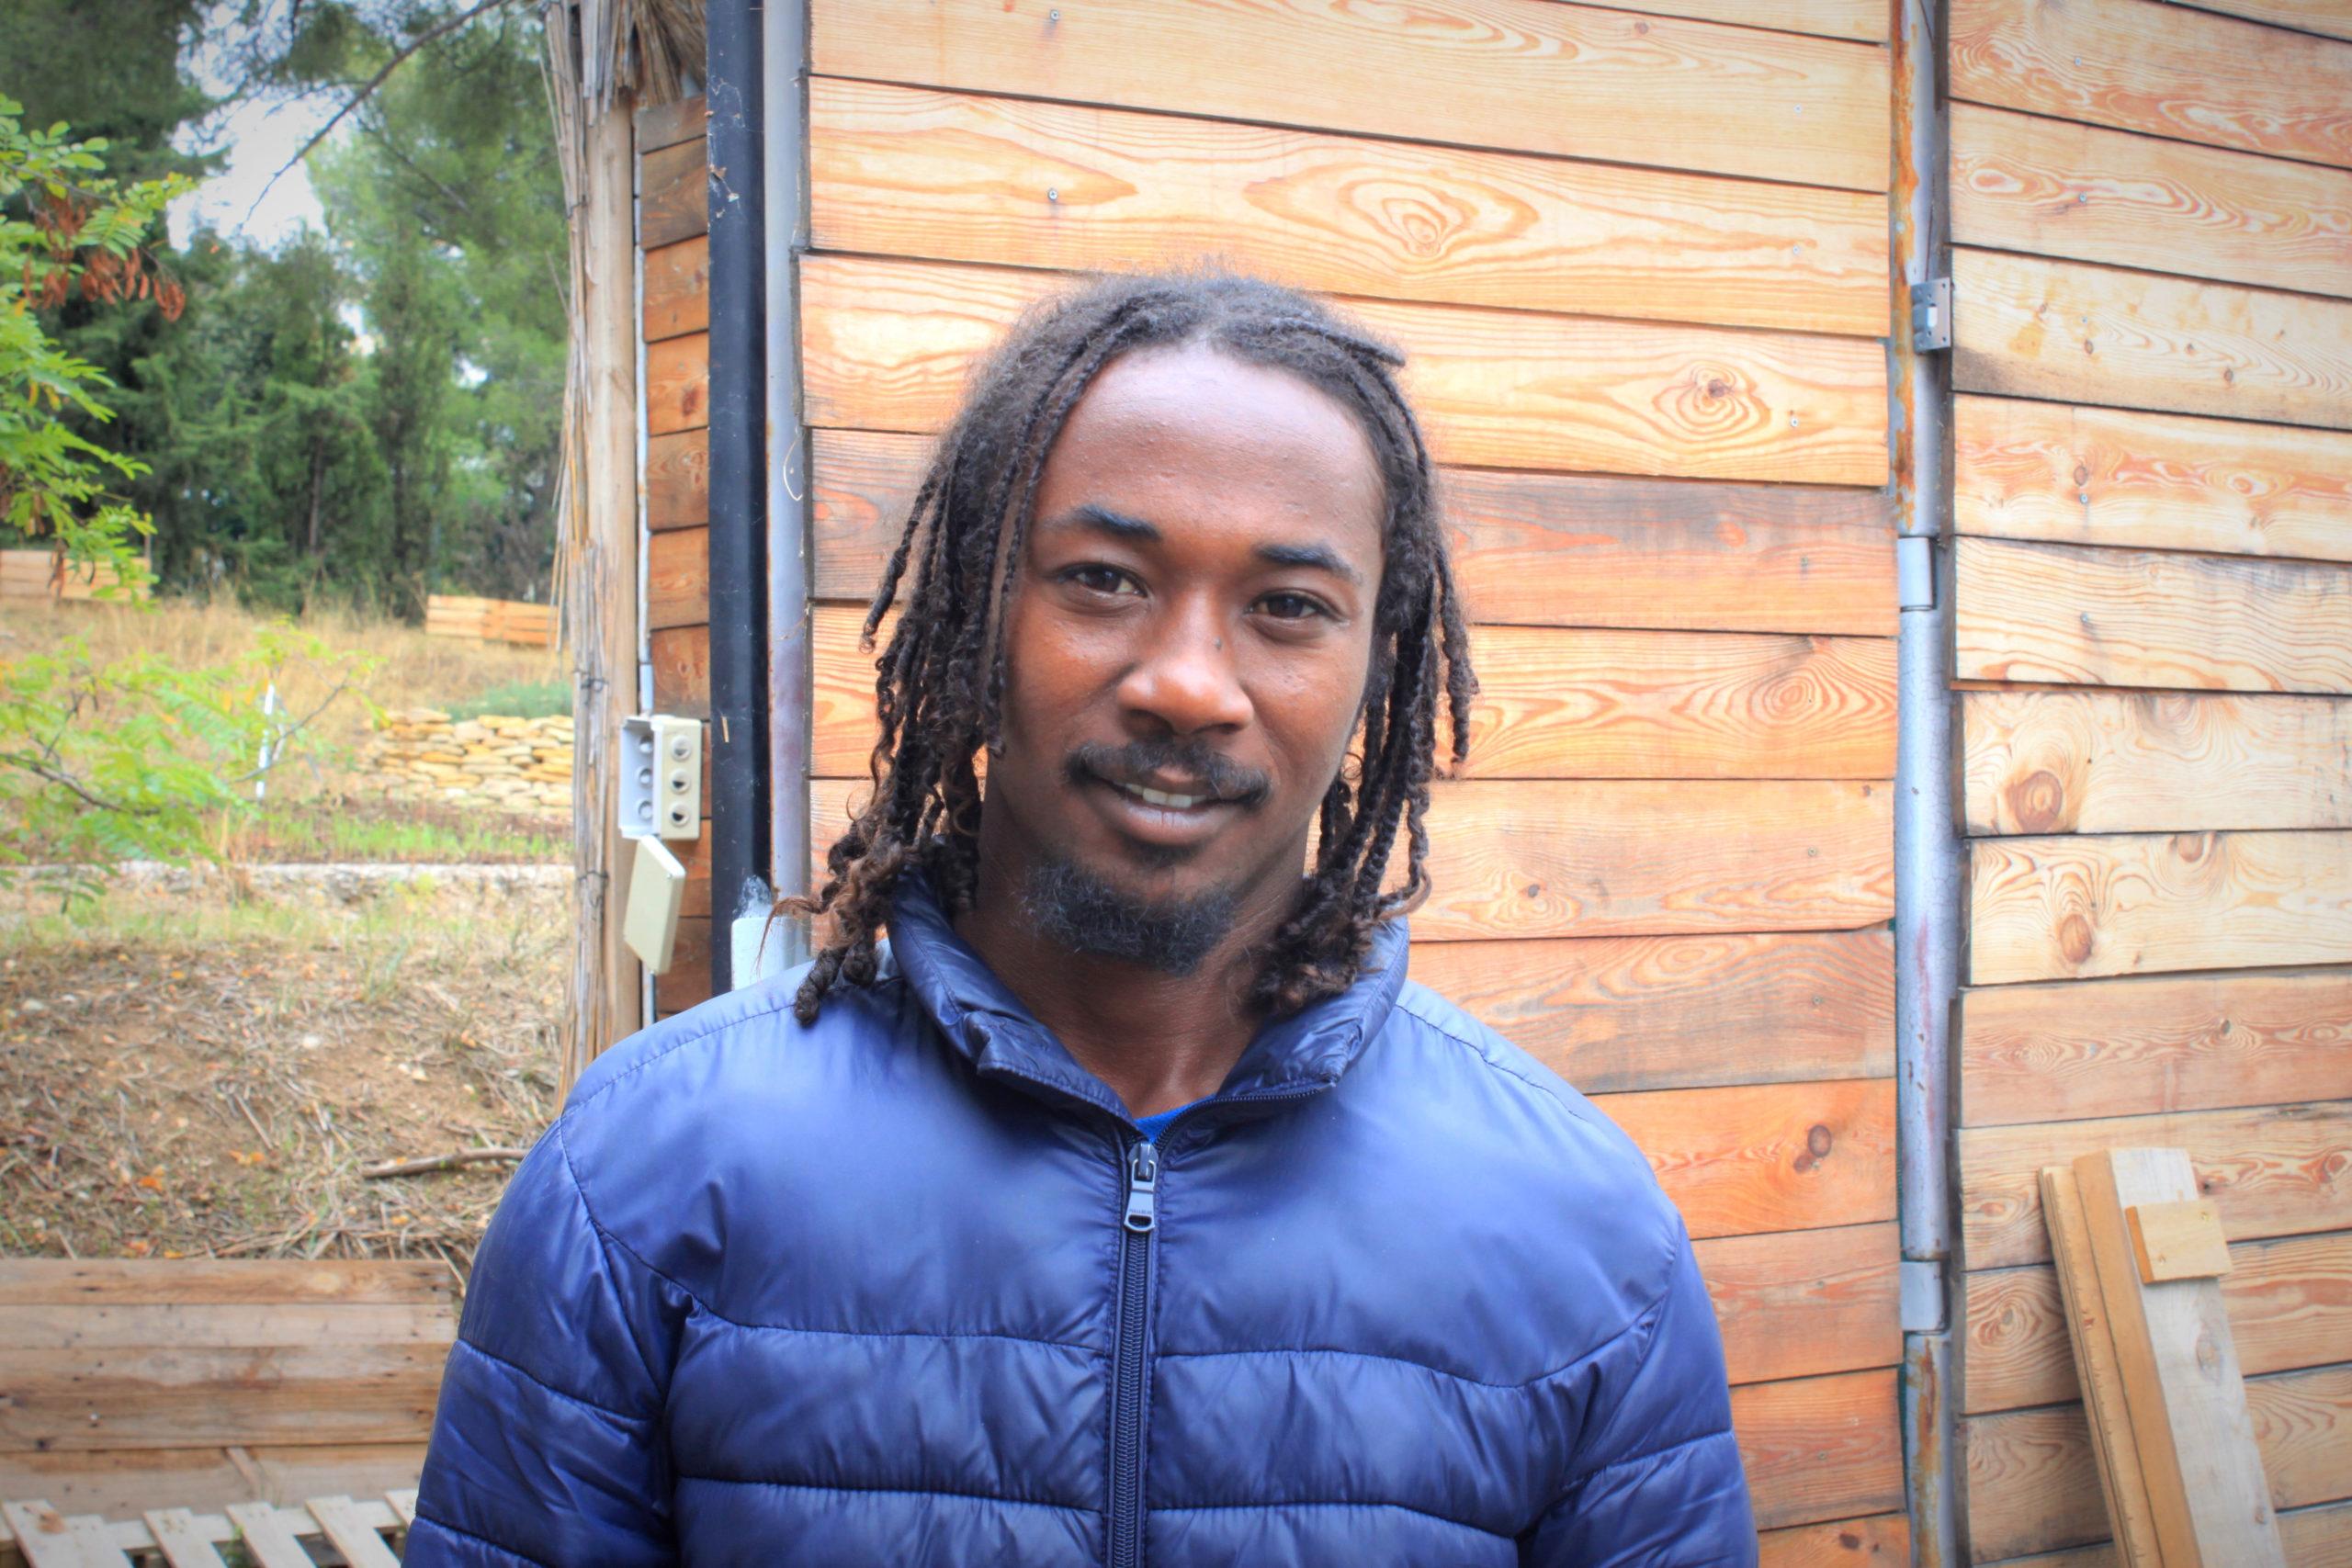 Témoignage Souleyman employé réinsertion professionnelle paysan urbain